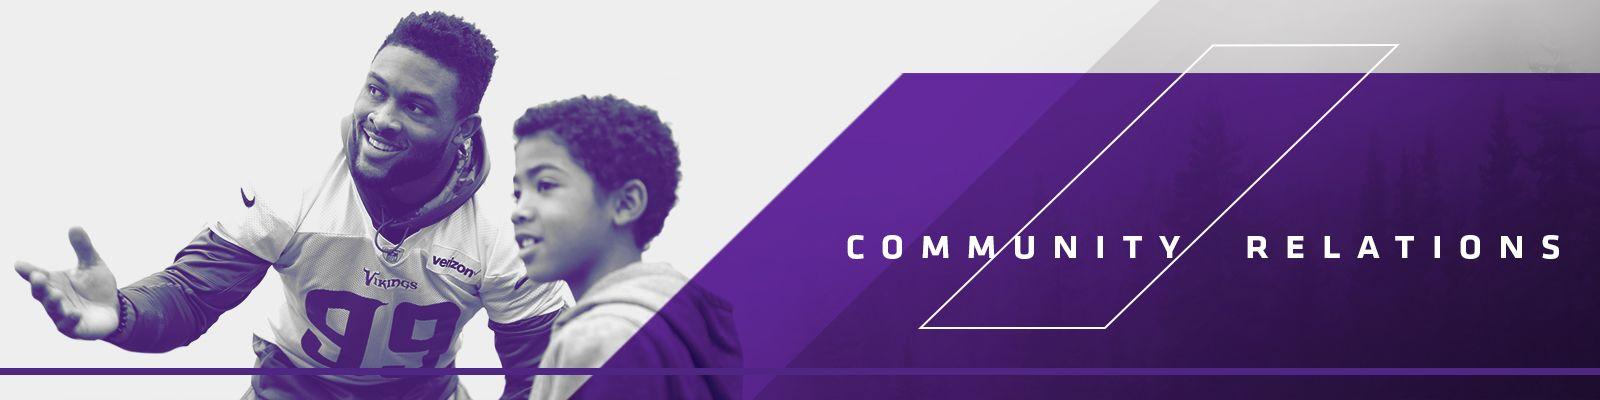 2019 community webpage header